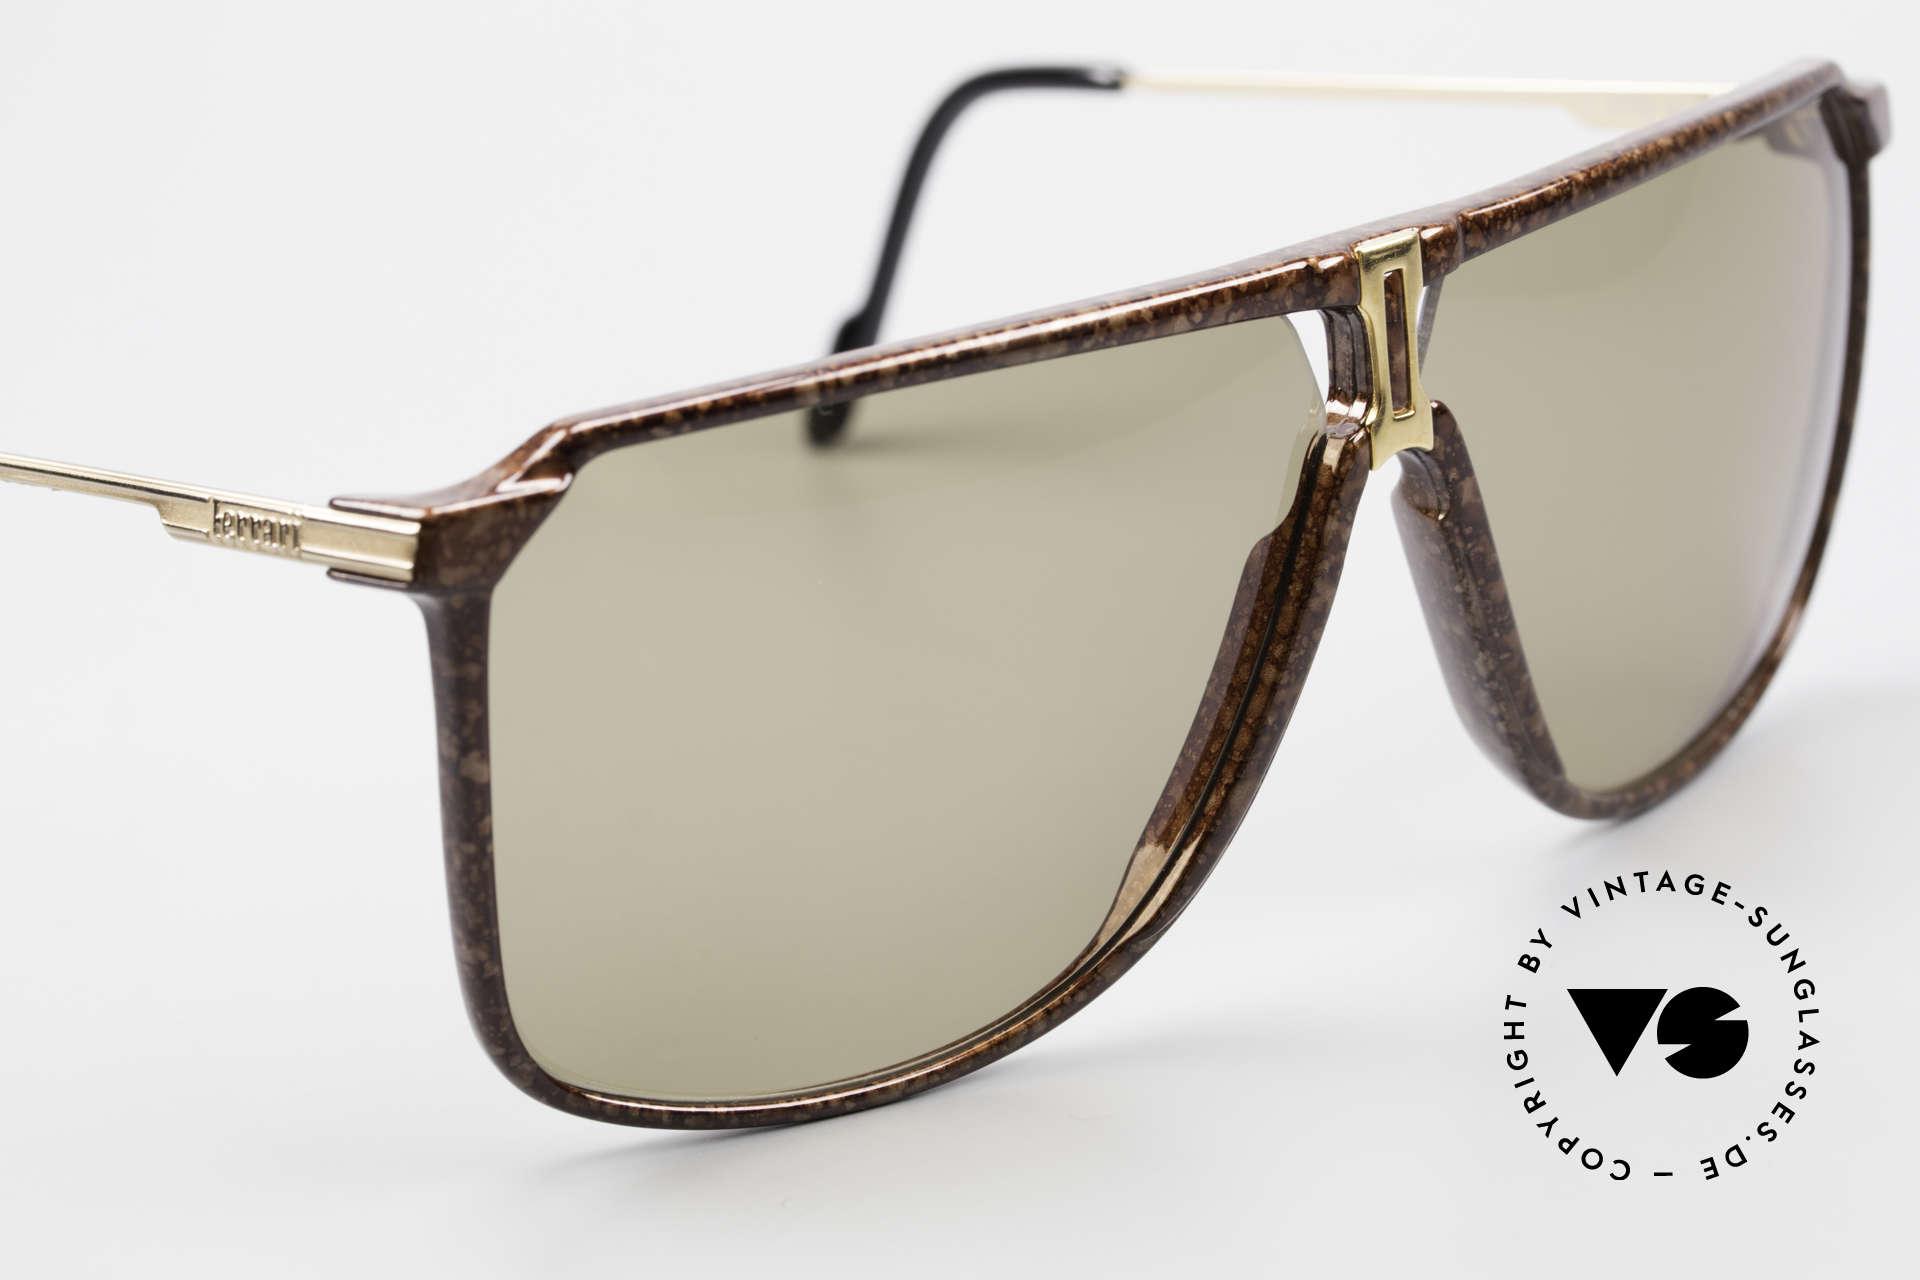 Ferrari F37/S 90's XL Sunglasses Carbonio, unworn (like all our rare Ferrari designer sunglasses), Made for Men